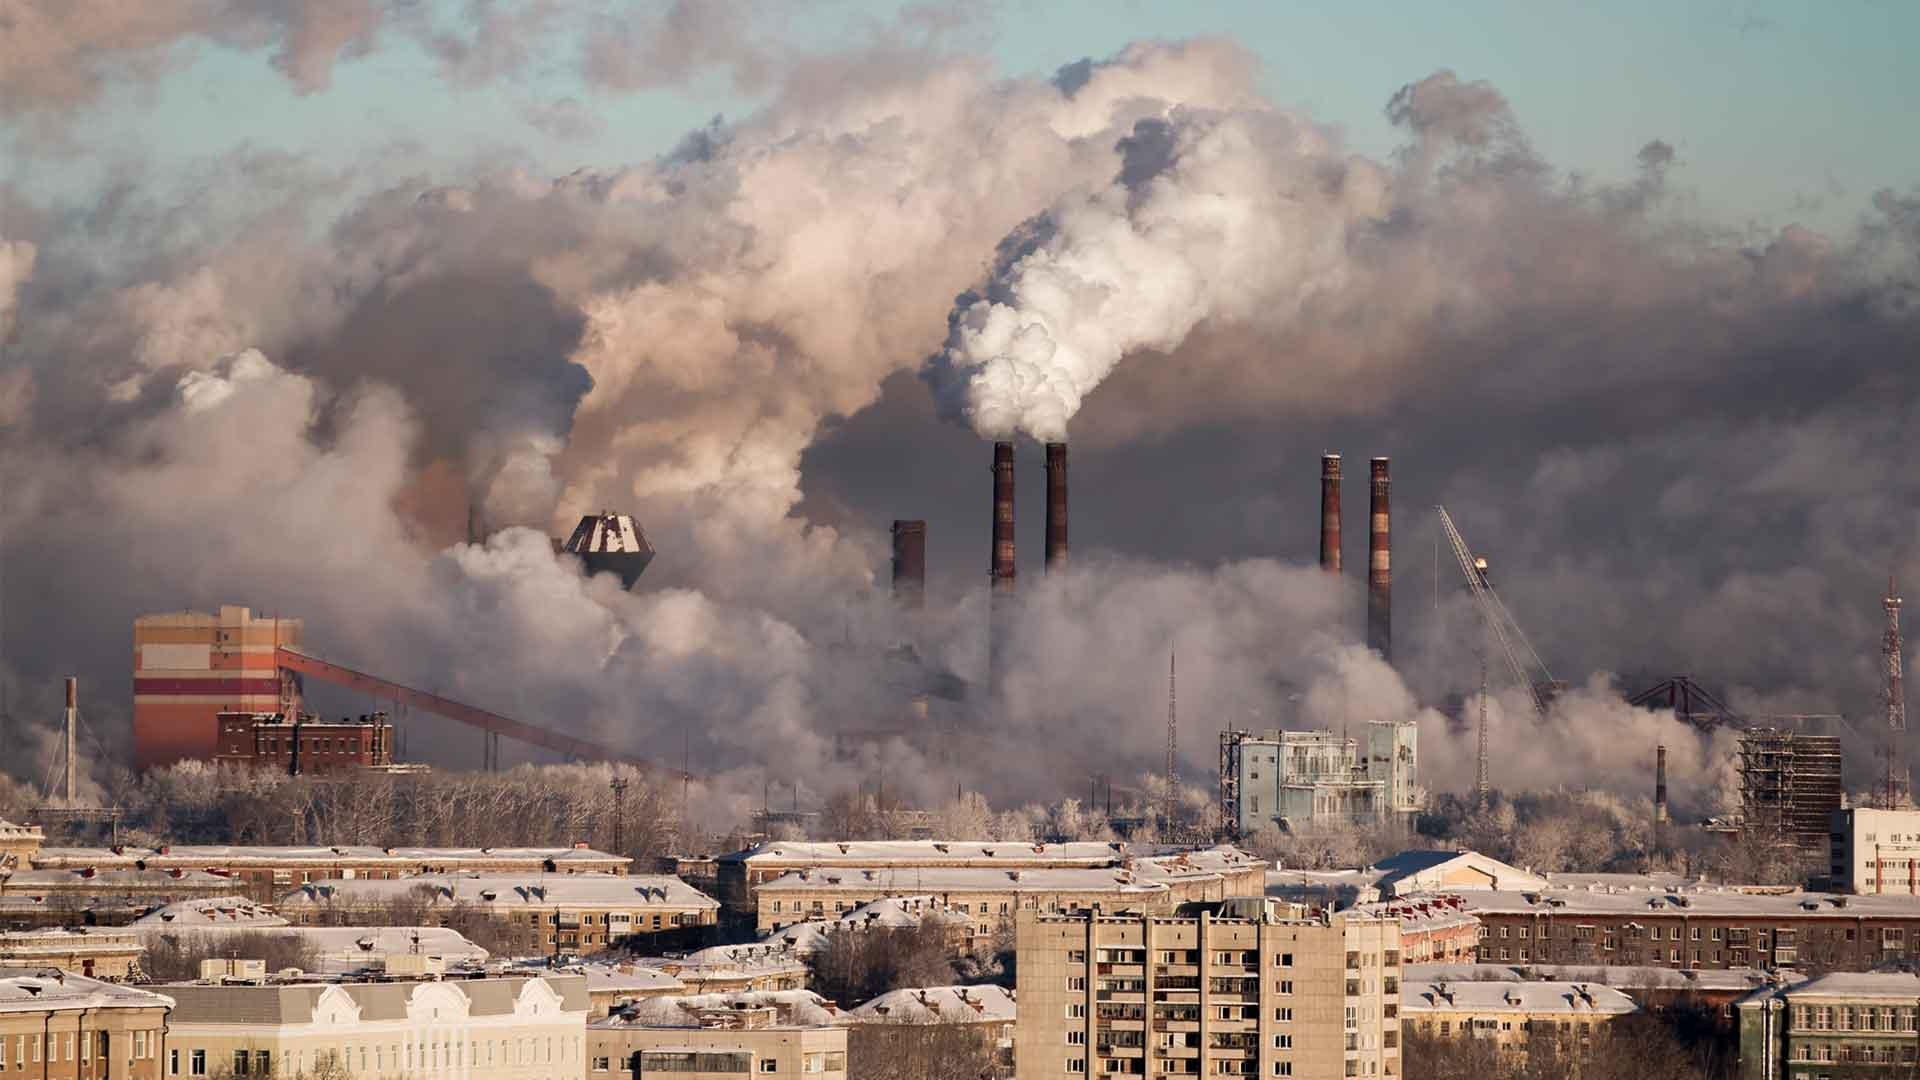 Boron - Decarbonization